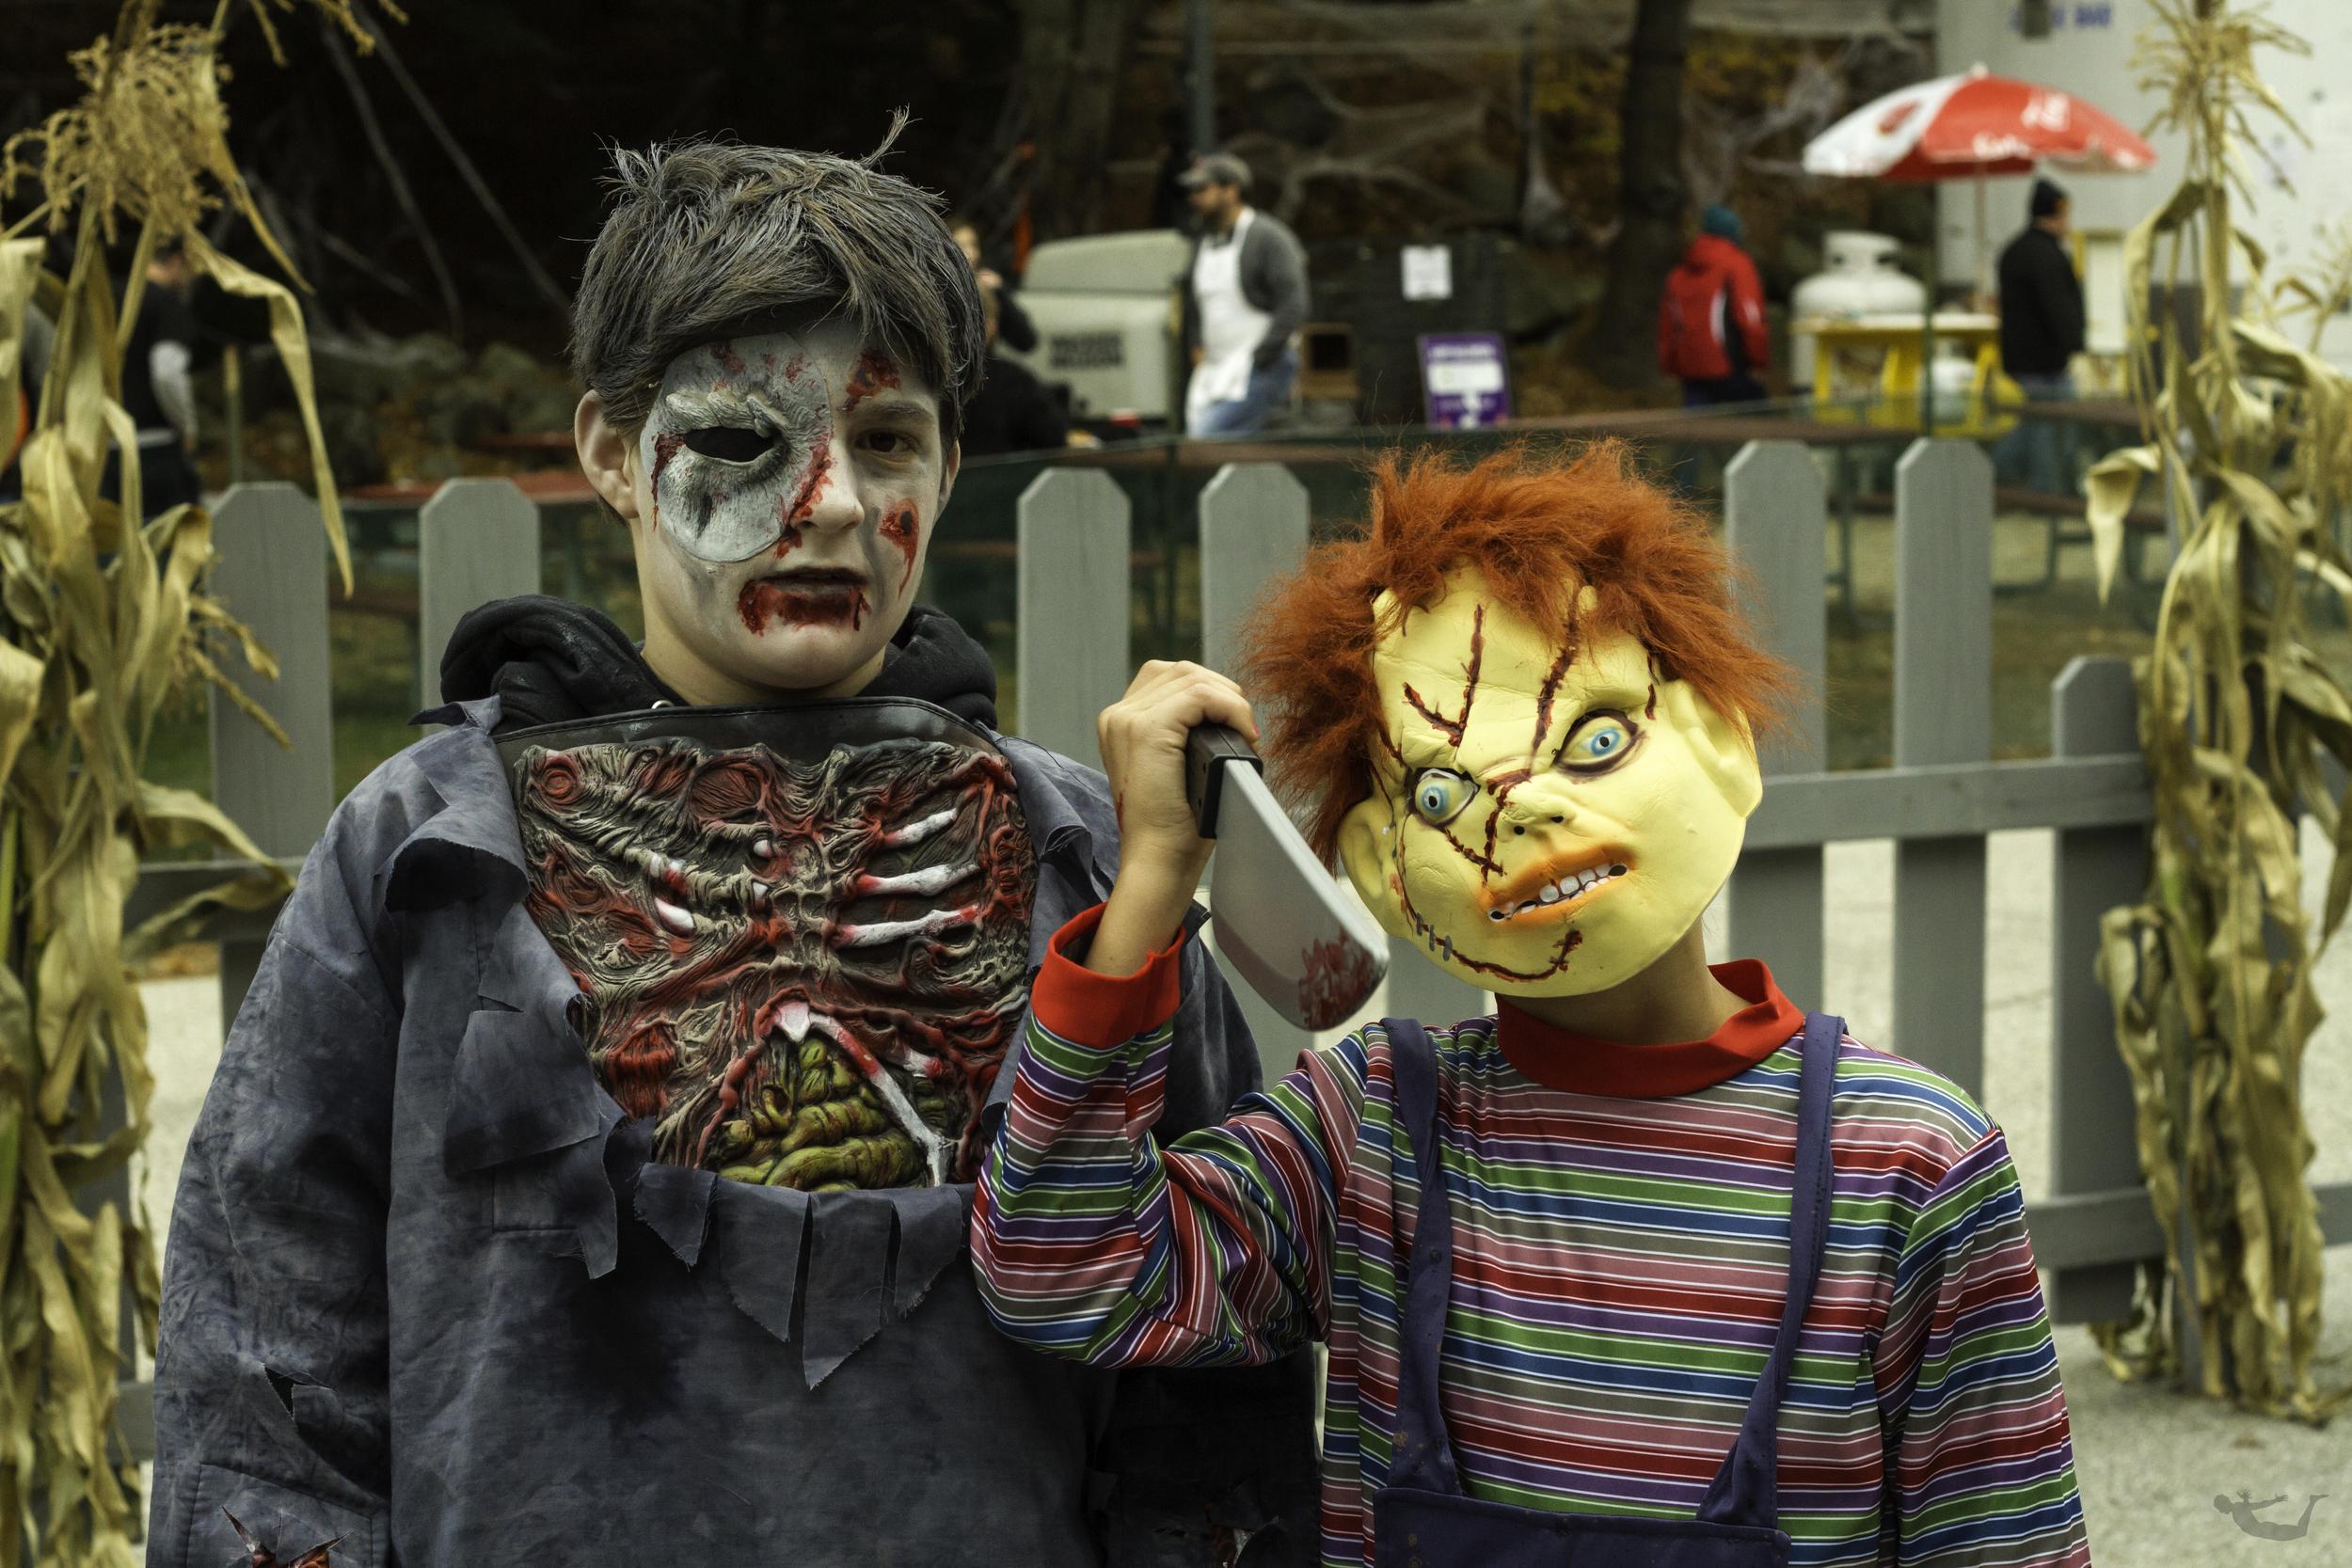 Spooky_.jpg